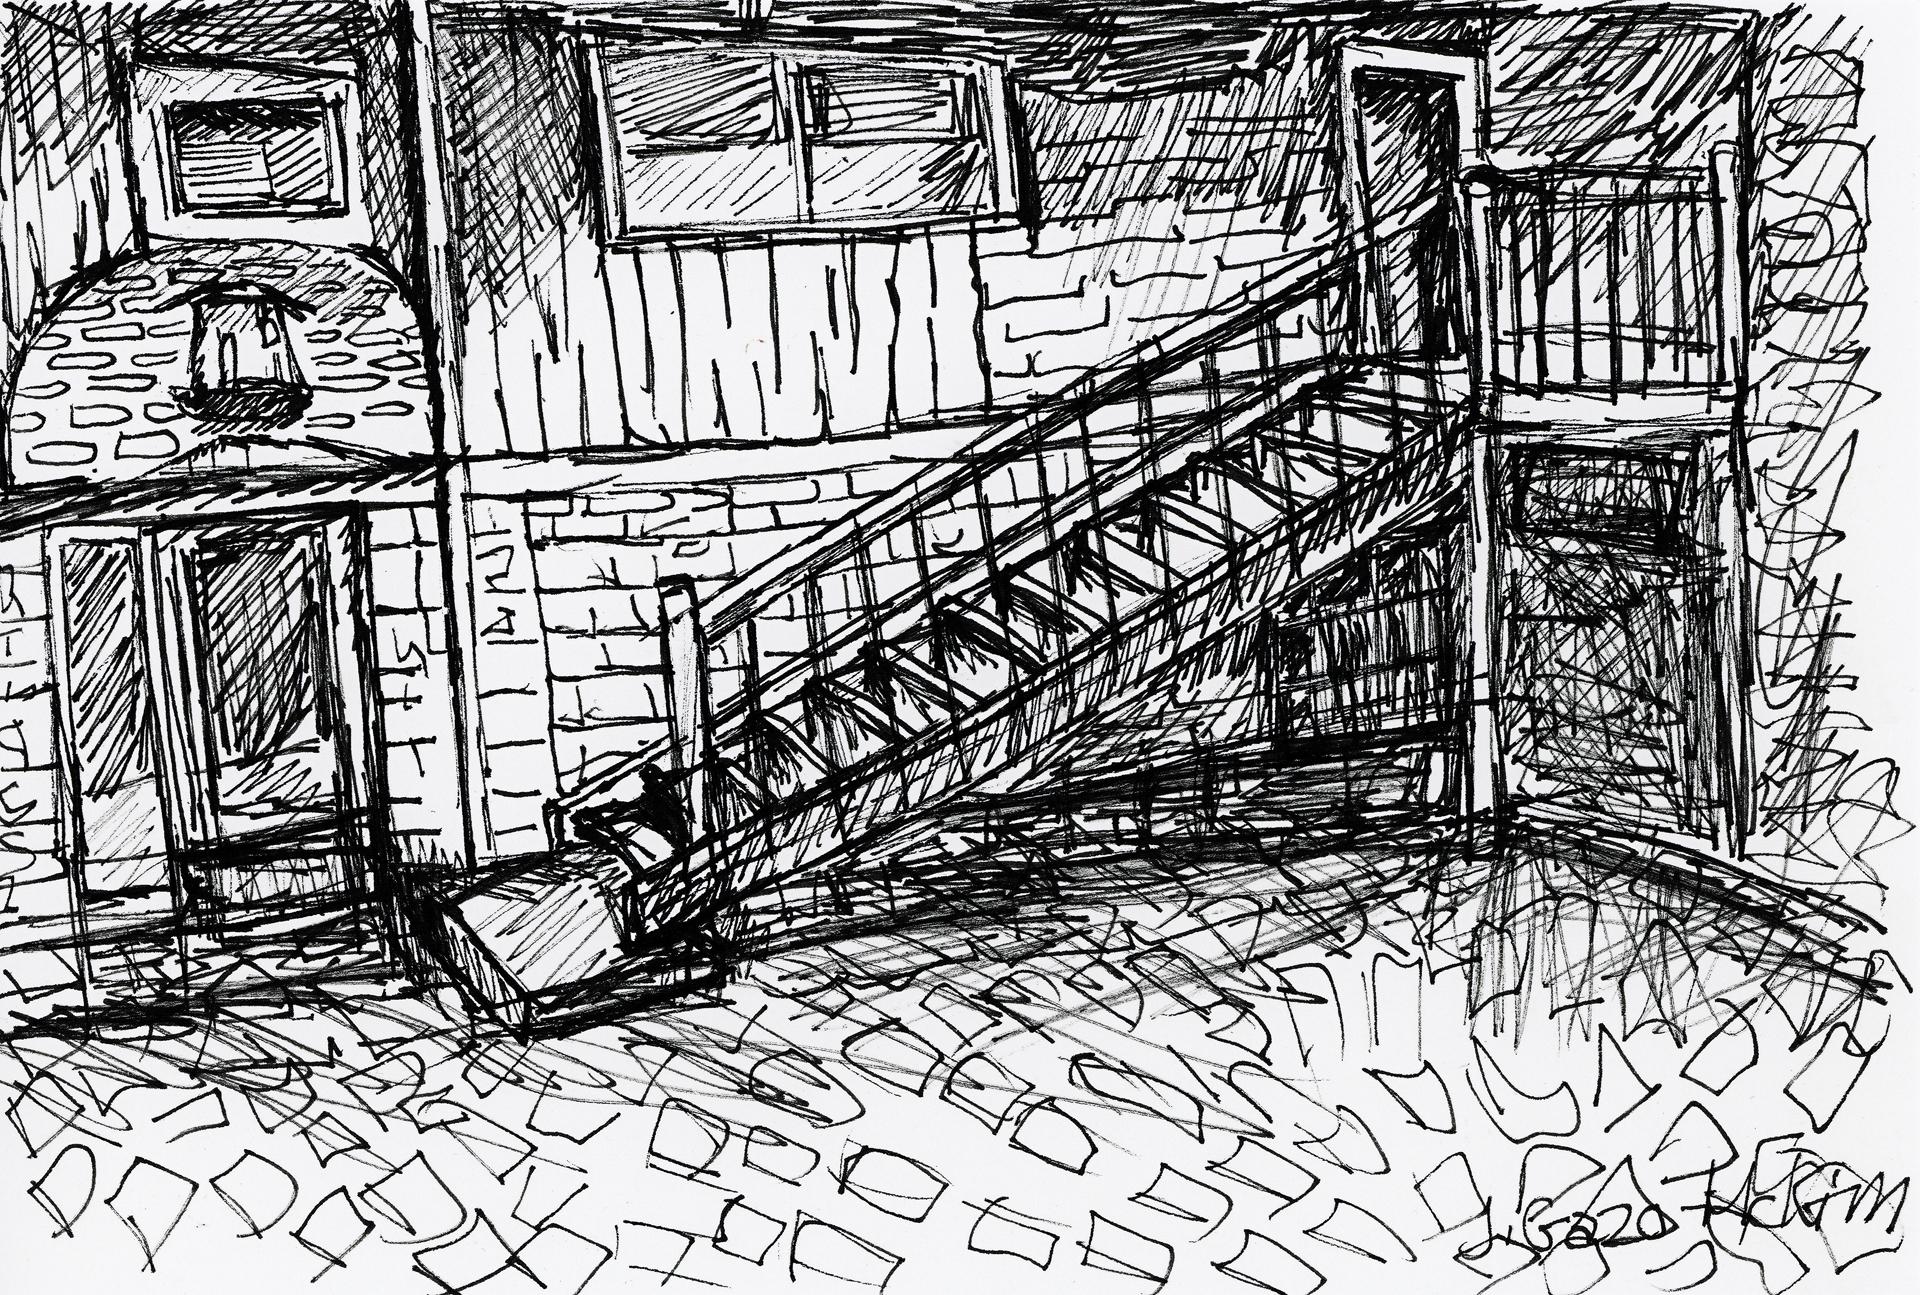 Martello Alley 01 Pen and Ink by J. Gazo-McKim ©2015